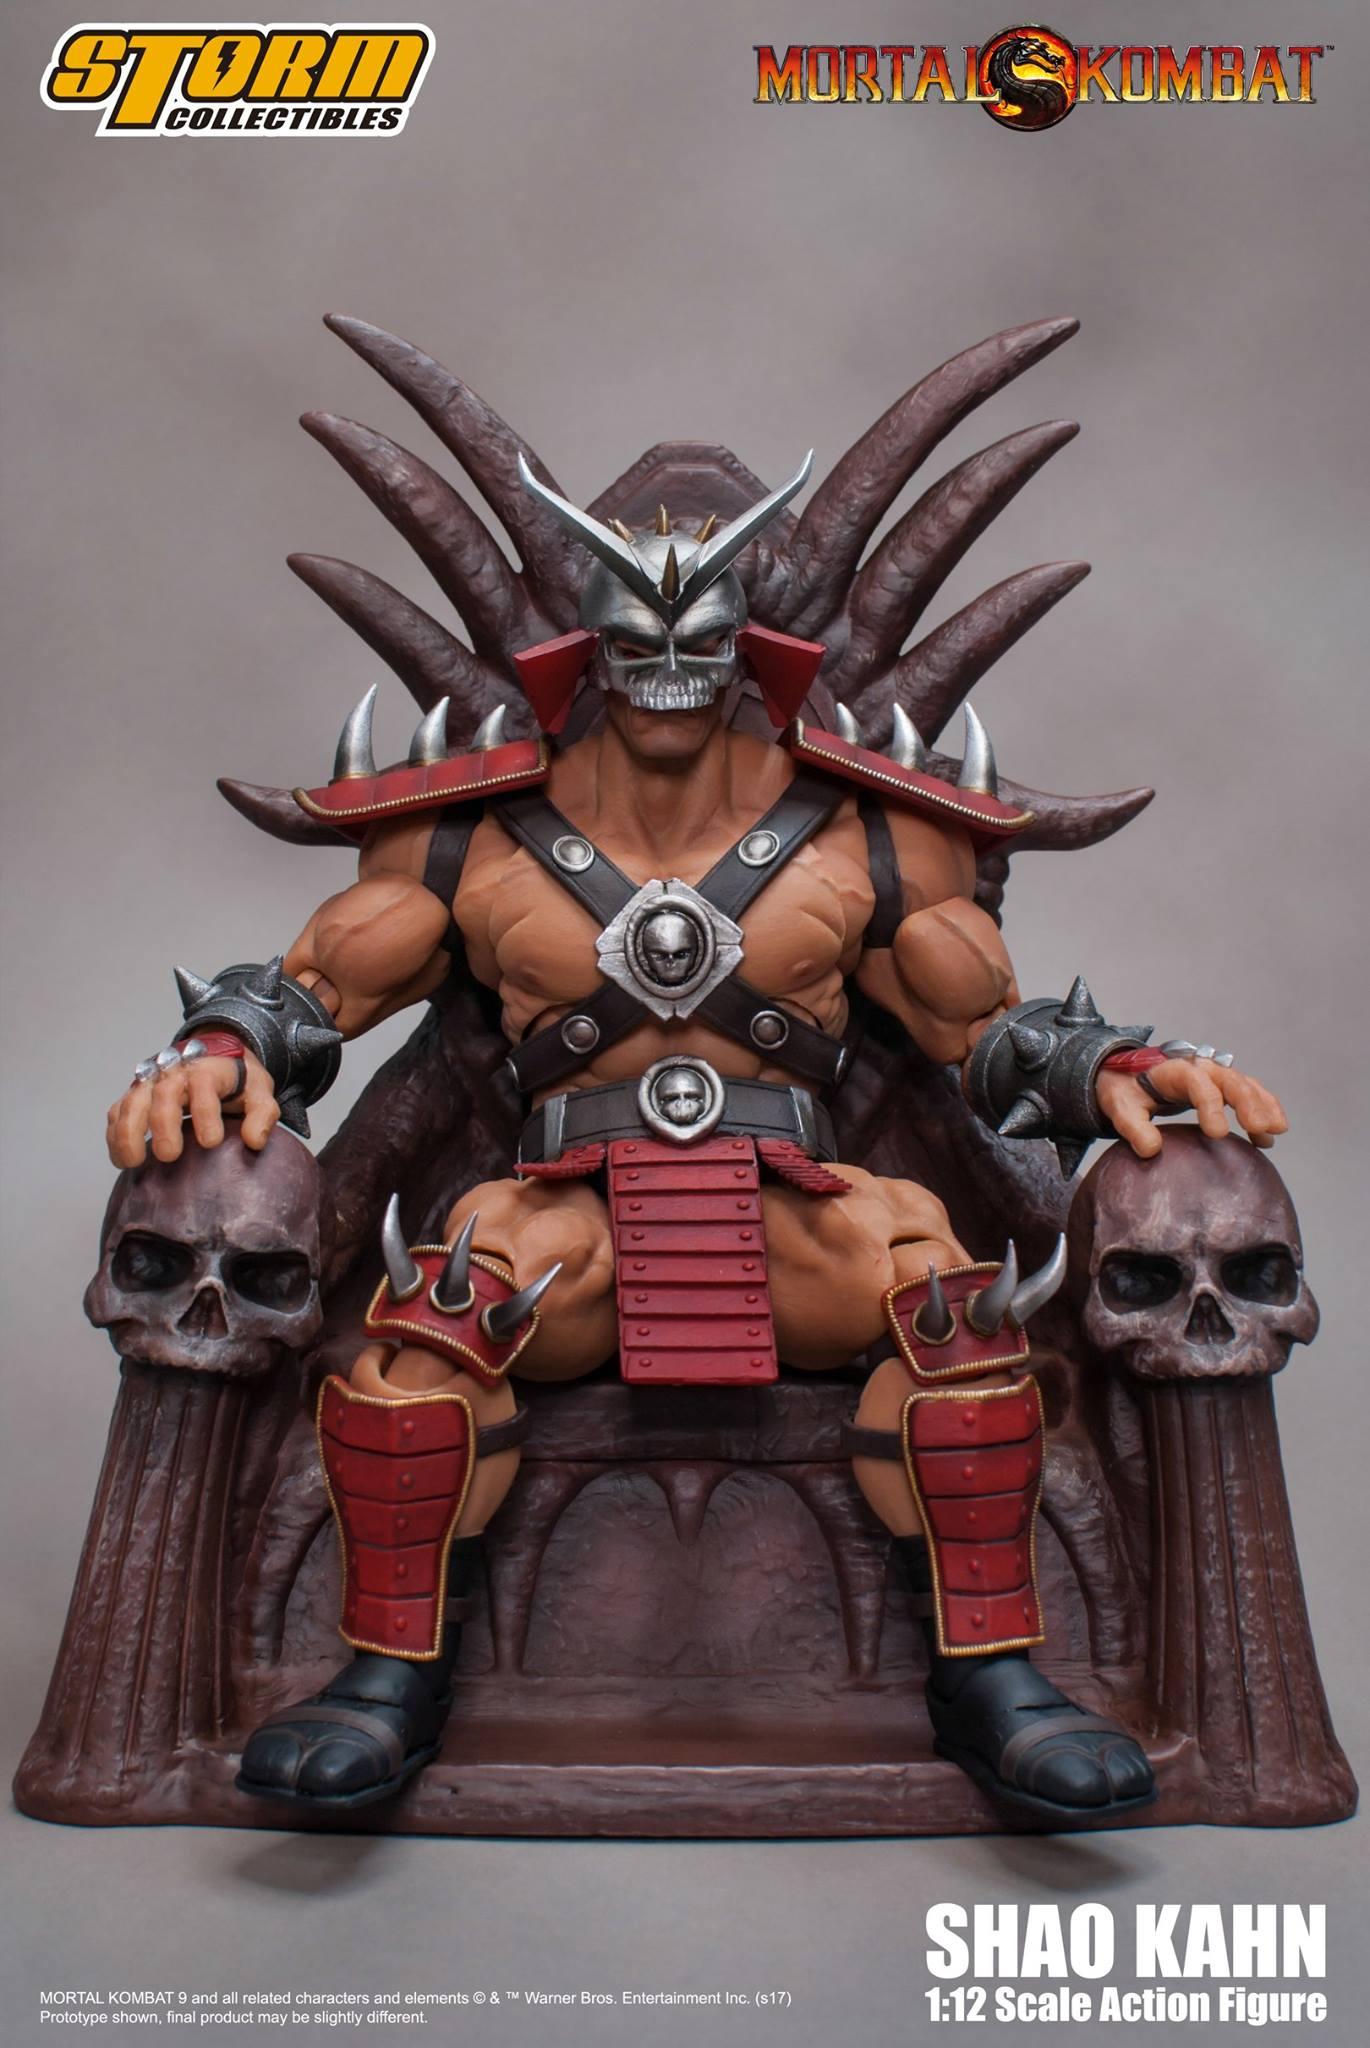 Storm-Mortal-Kombat-Shao-Kahn-003